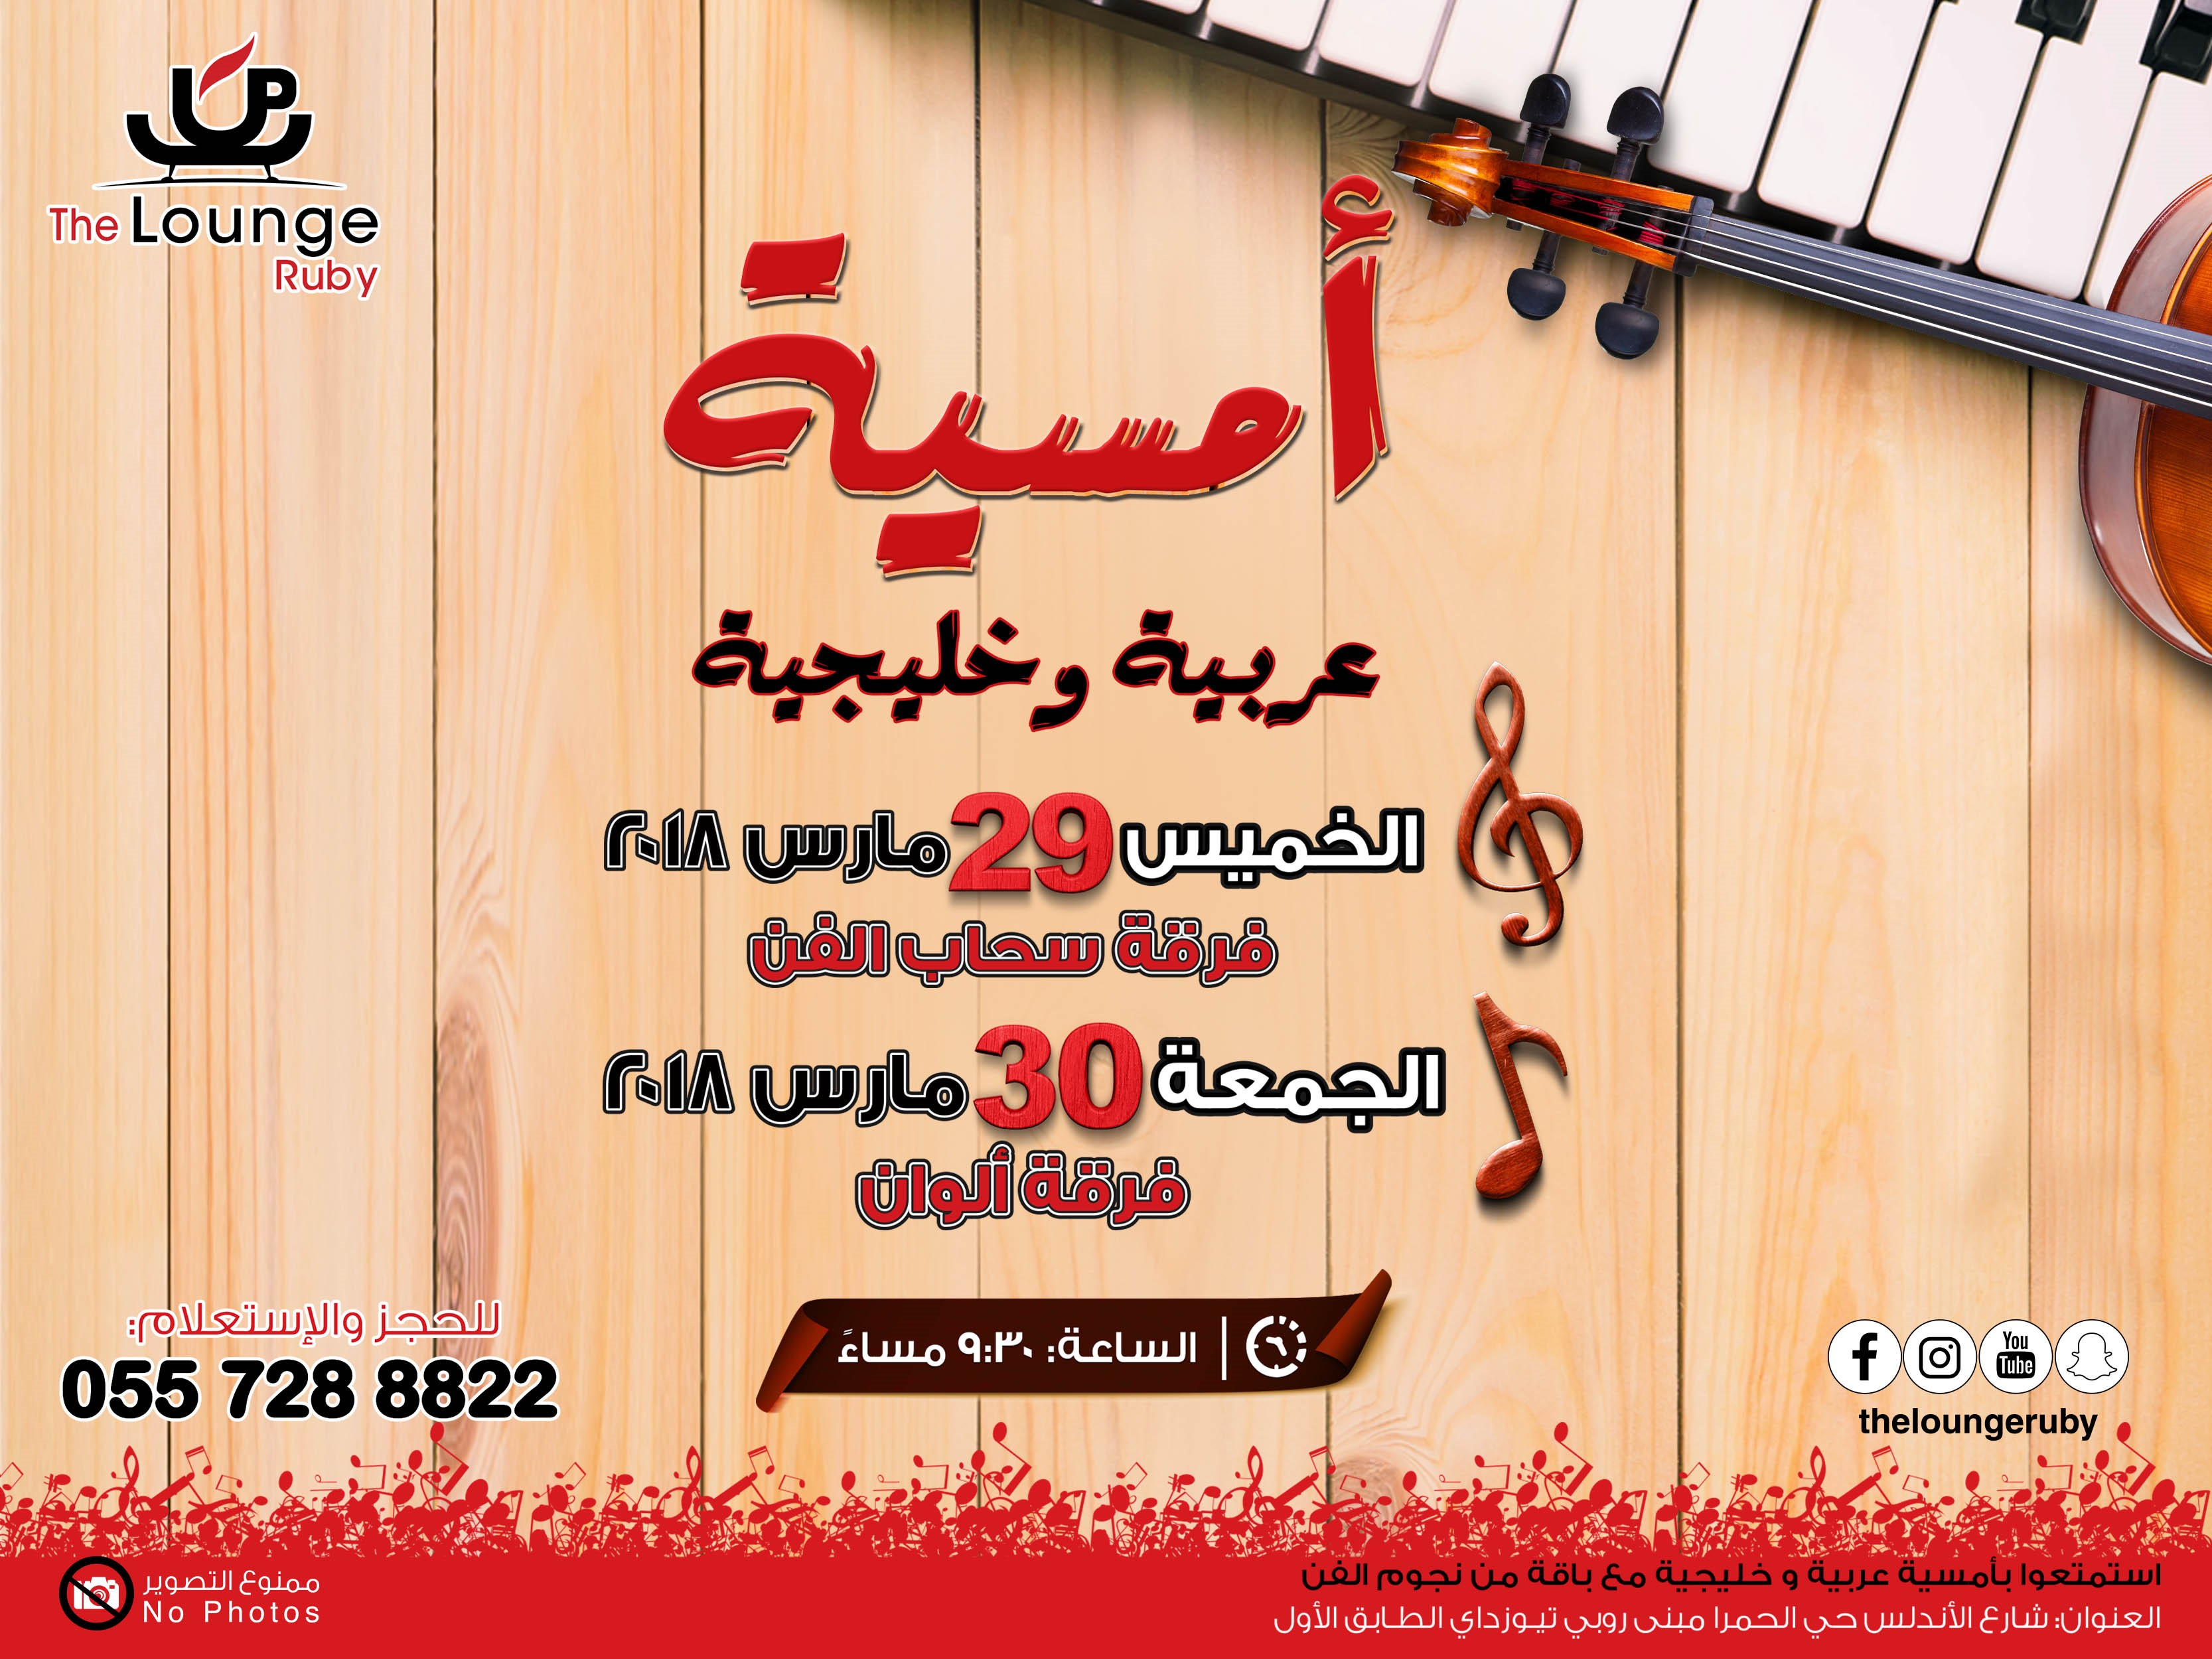 Hijaz Malls :: Arabic Night At The Lounge Ruby 18 And 19